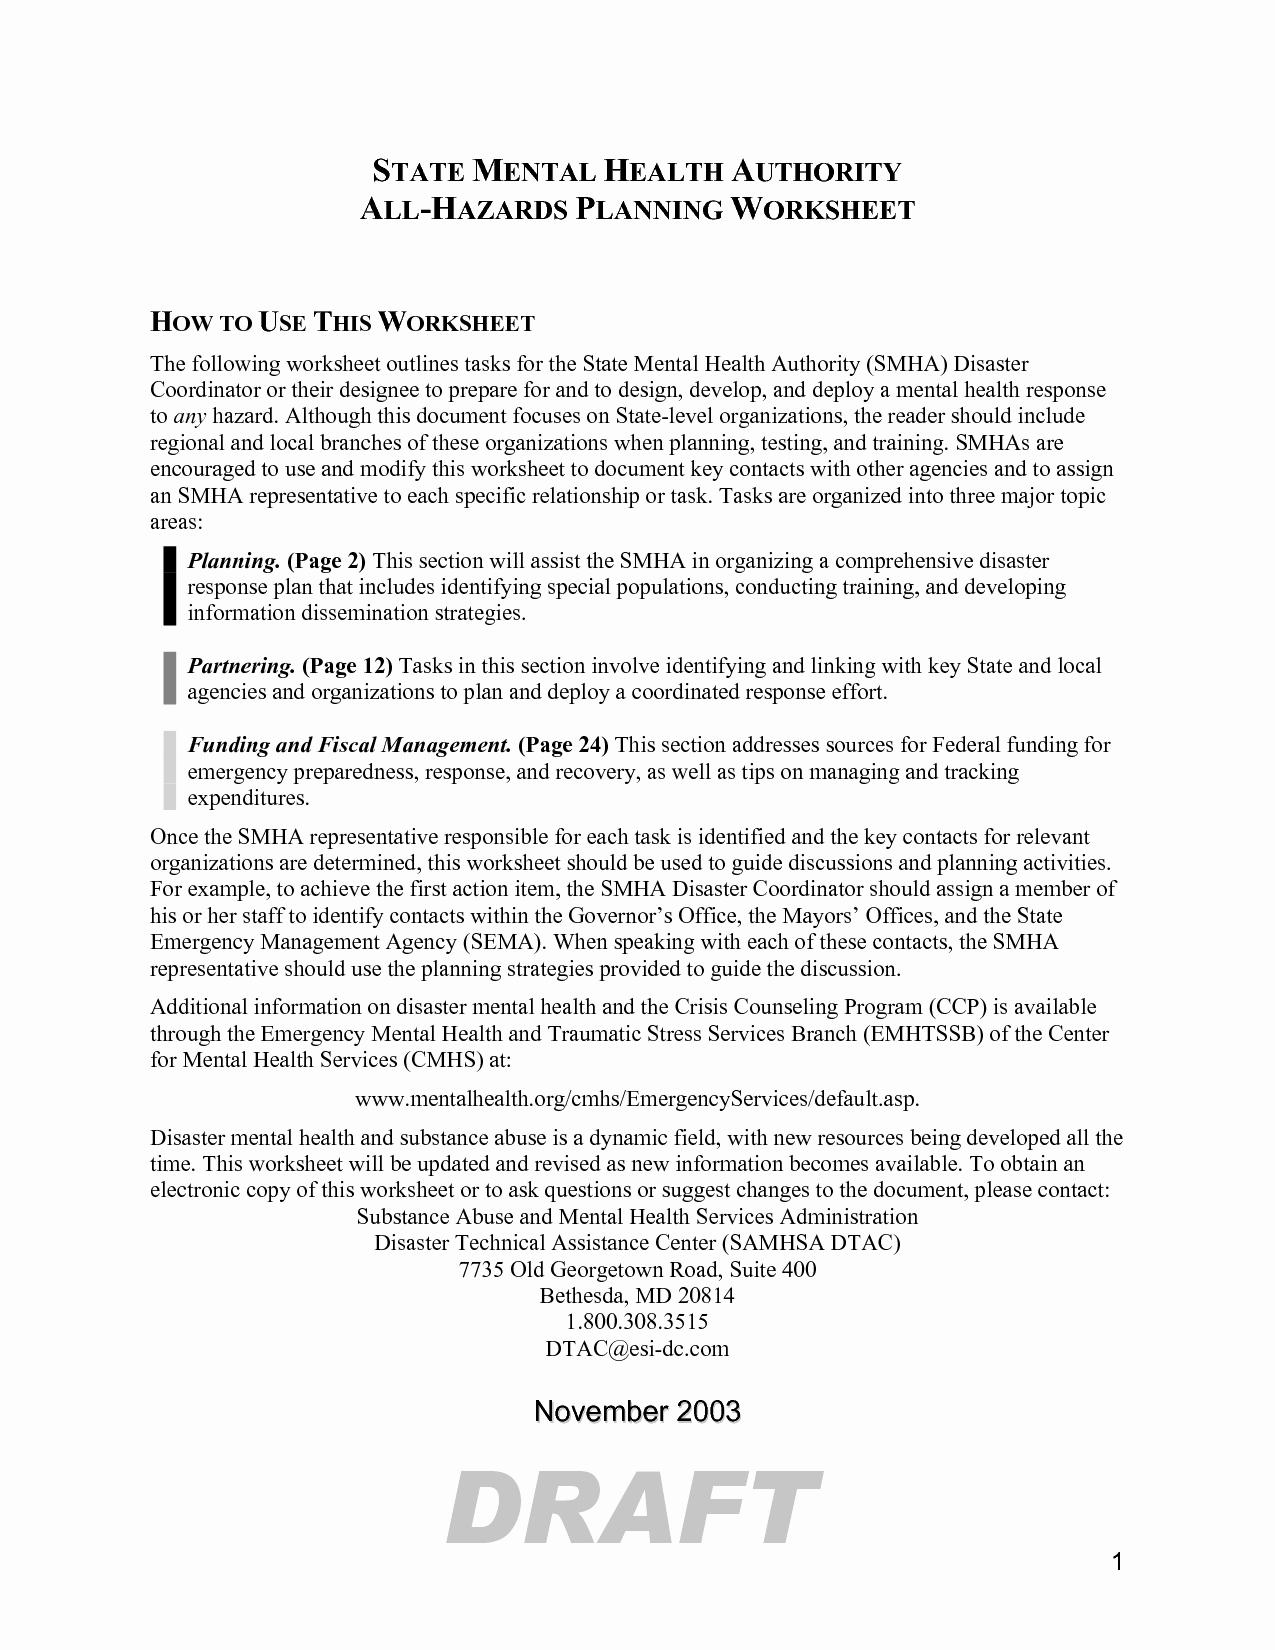 post mental health crisis plan worksheet